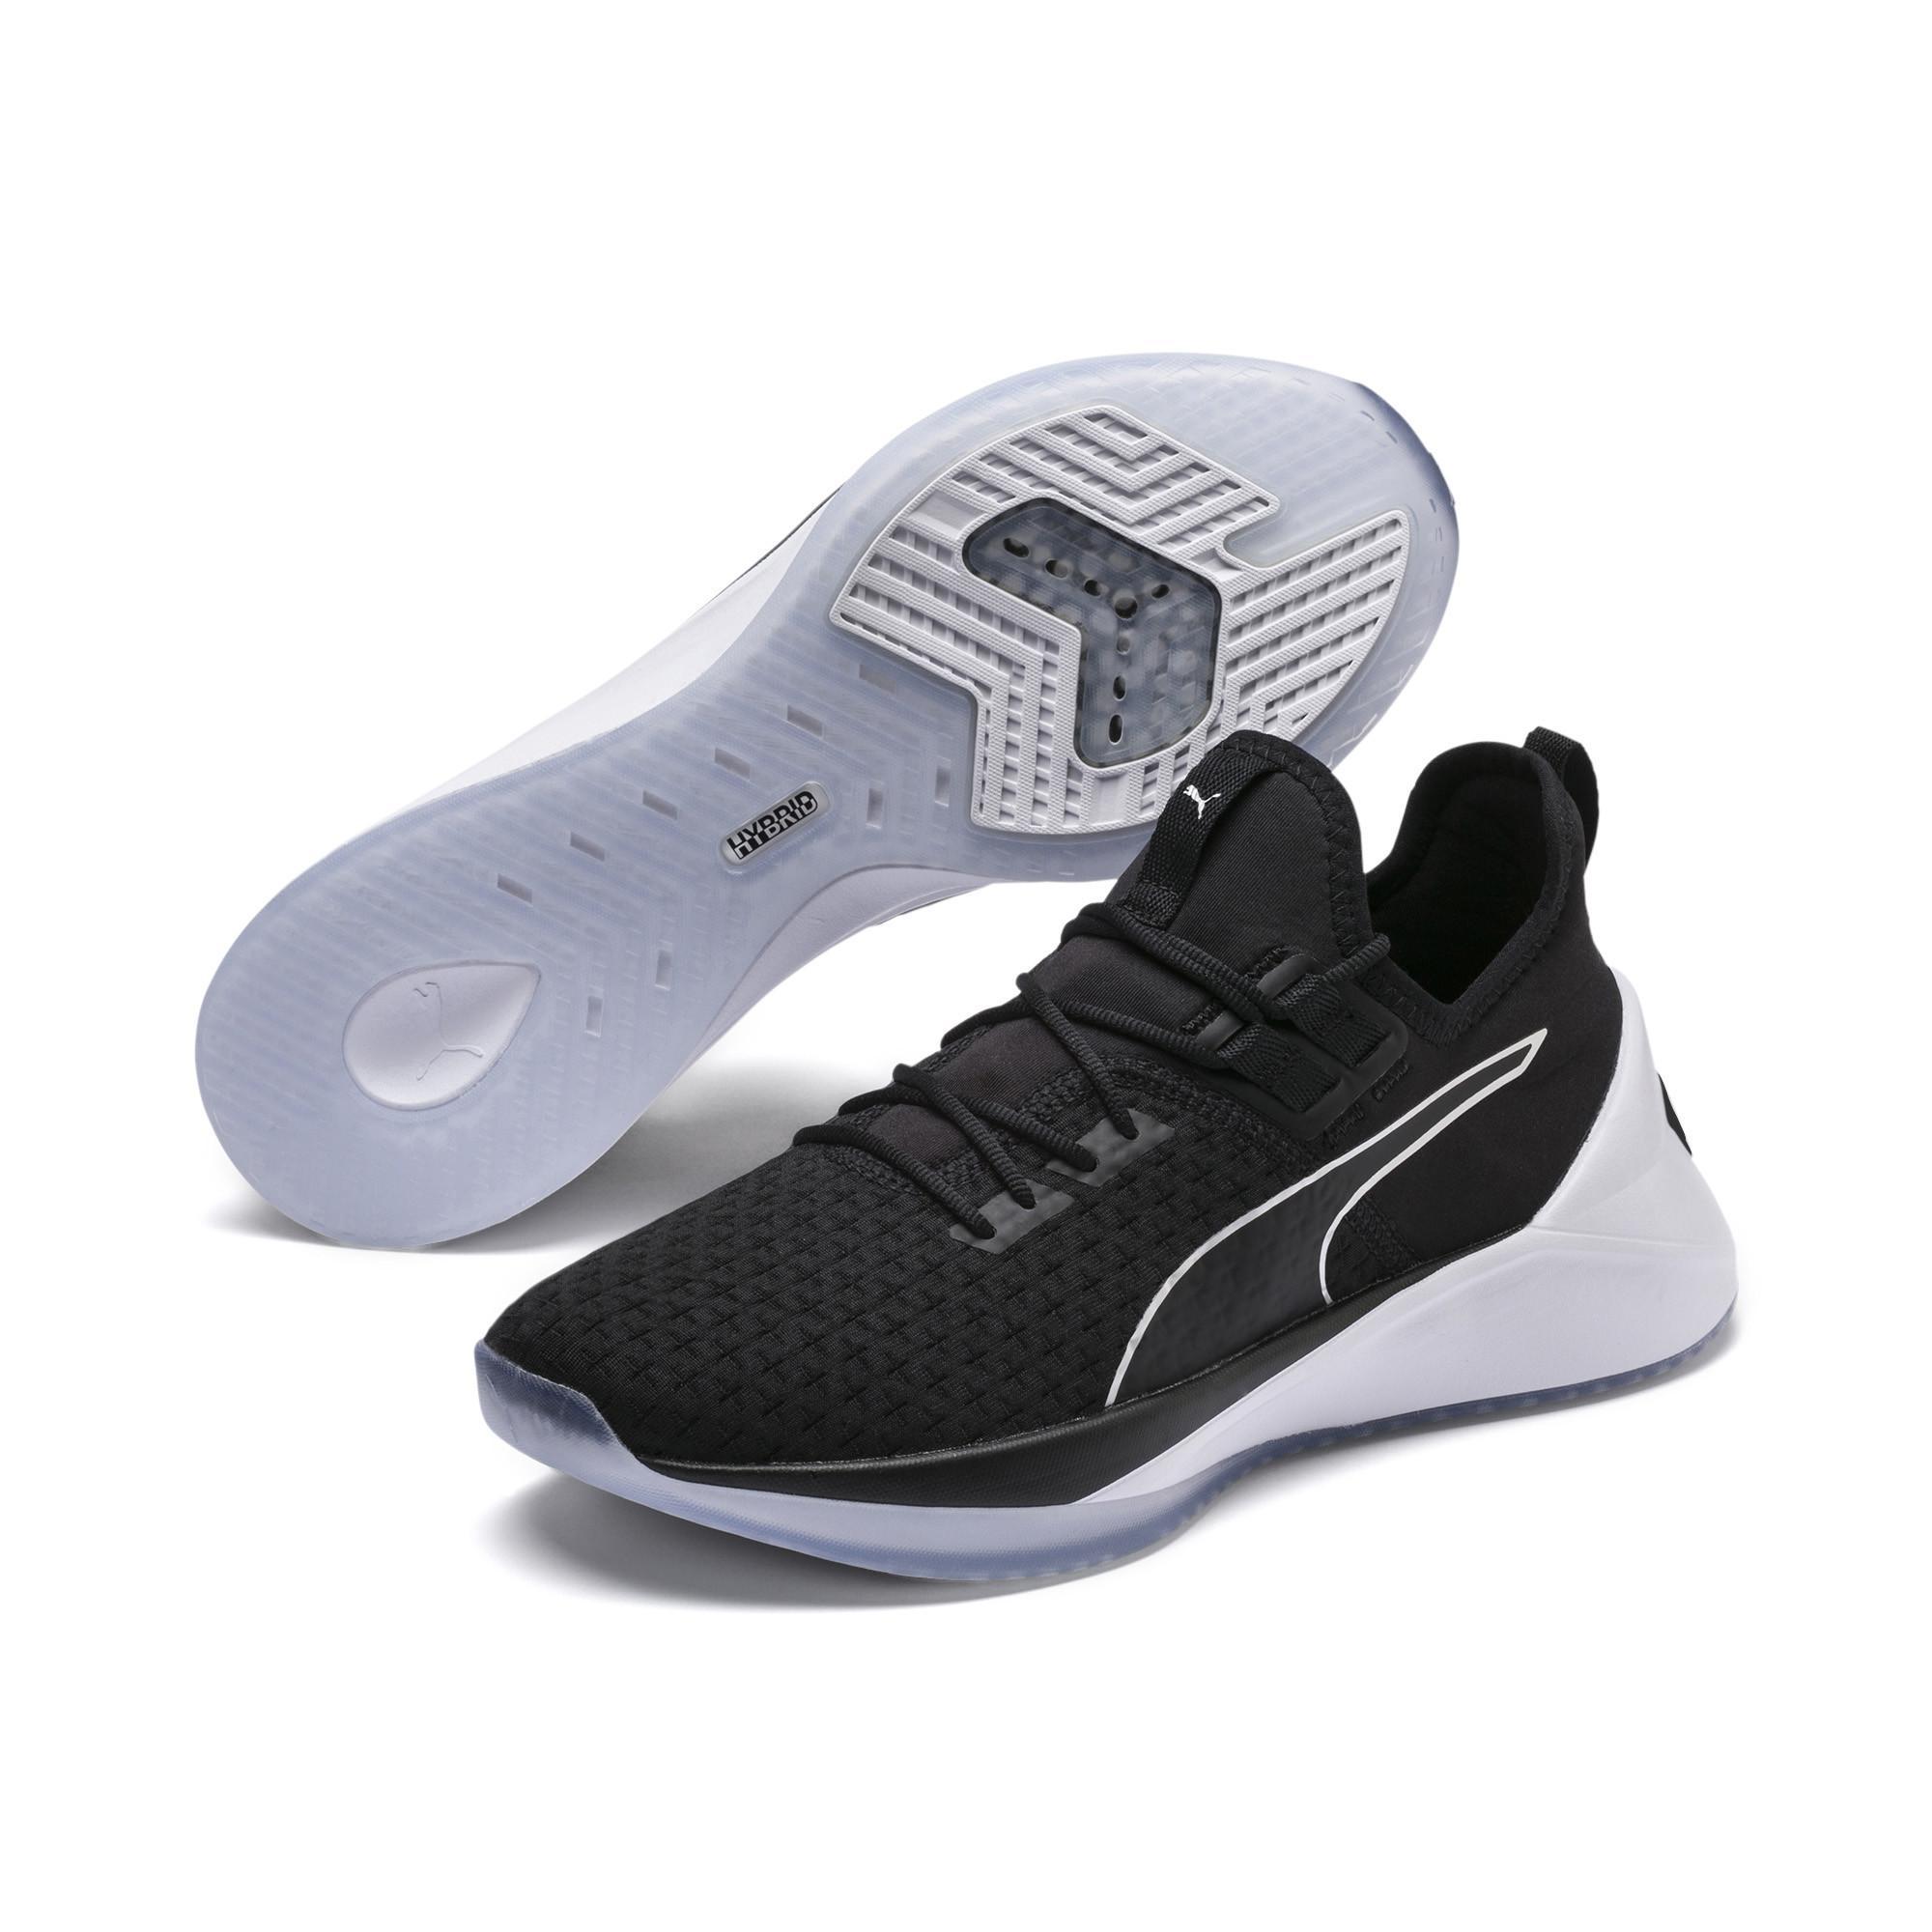 01b47e93e3b Lyst - PUMA Jaab Xt Fs Women s Training Shoes for Men